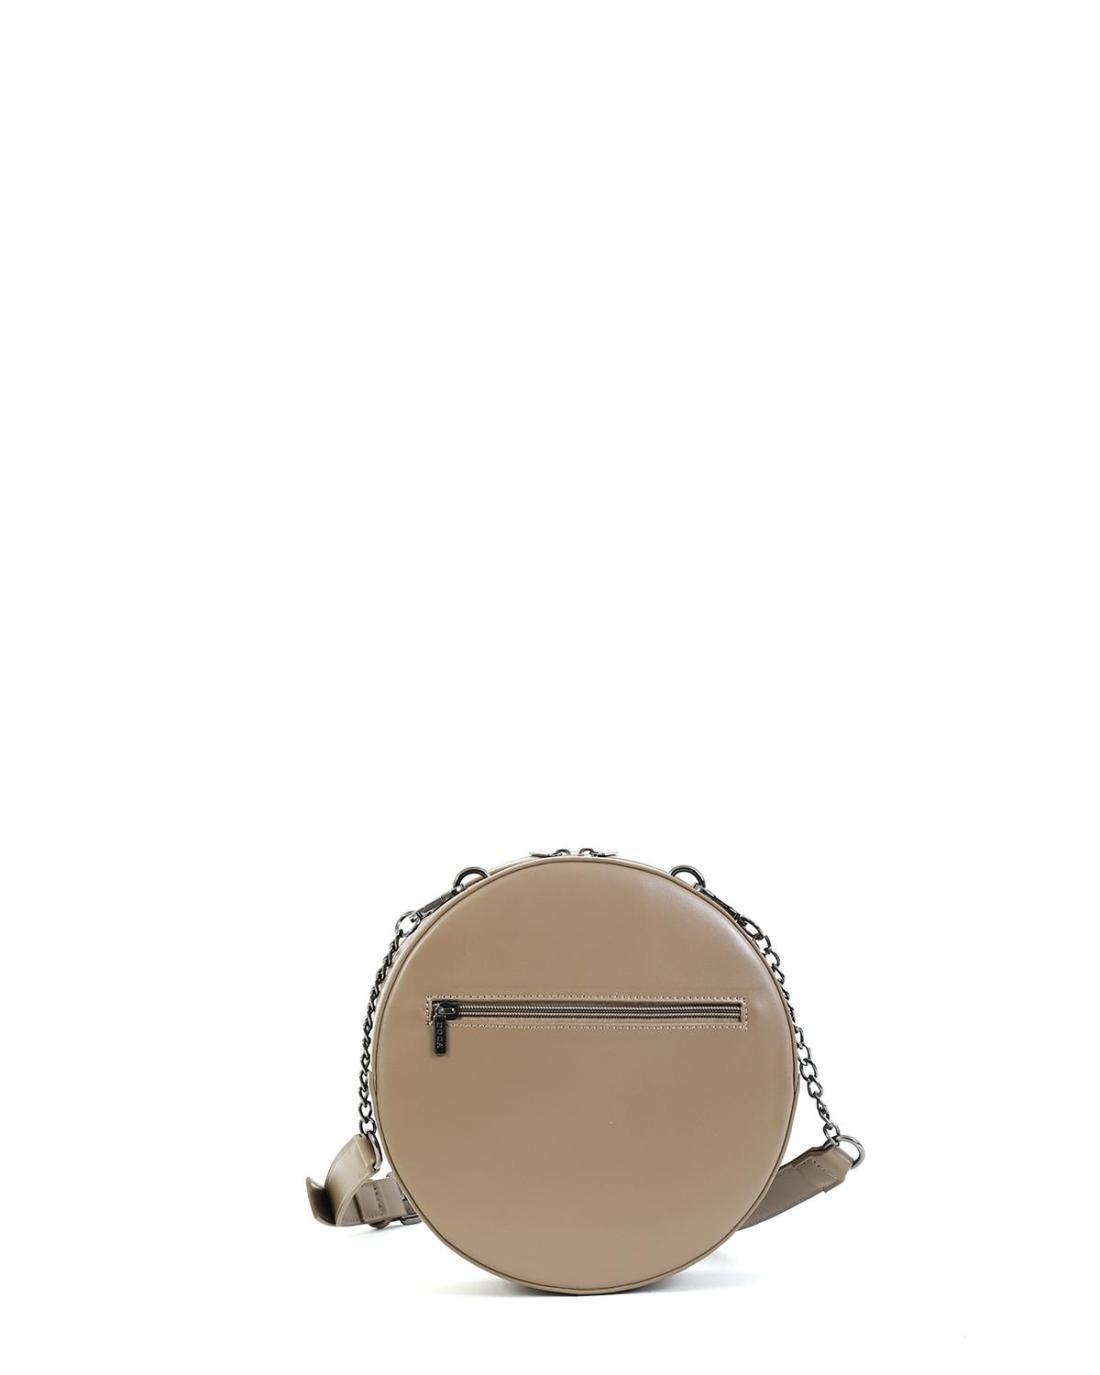 Grey cross body bag